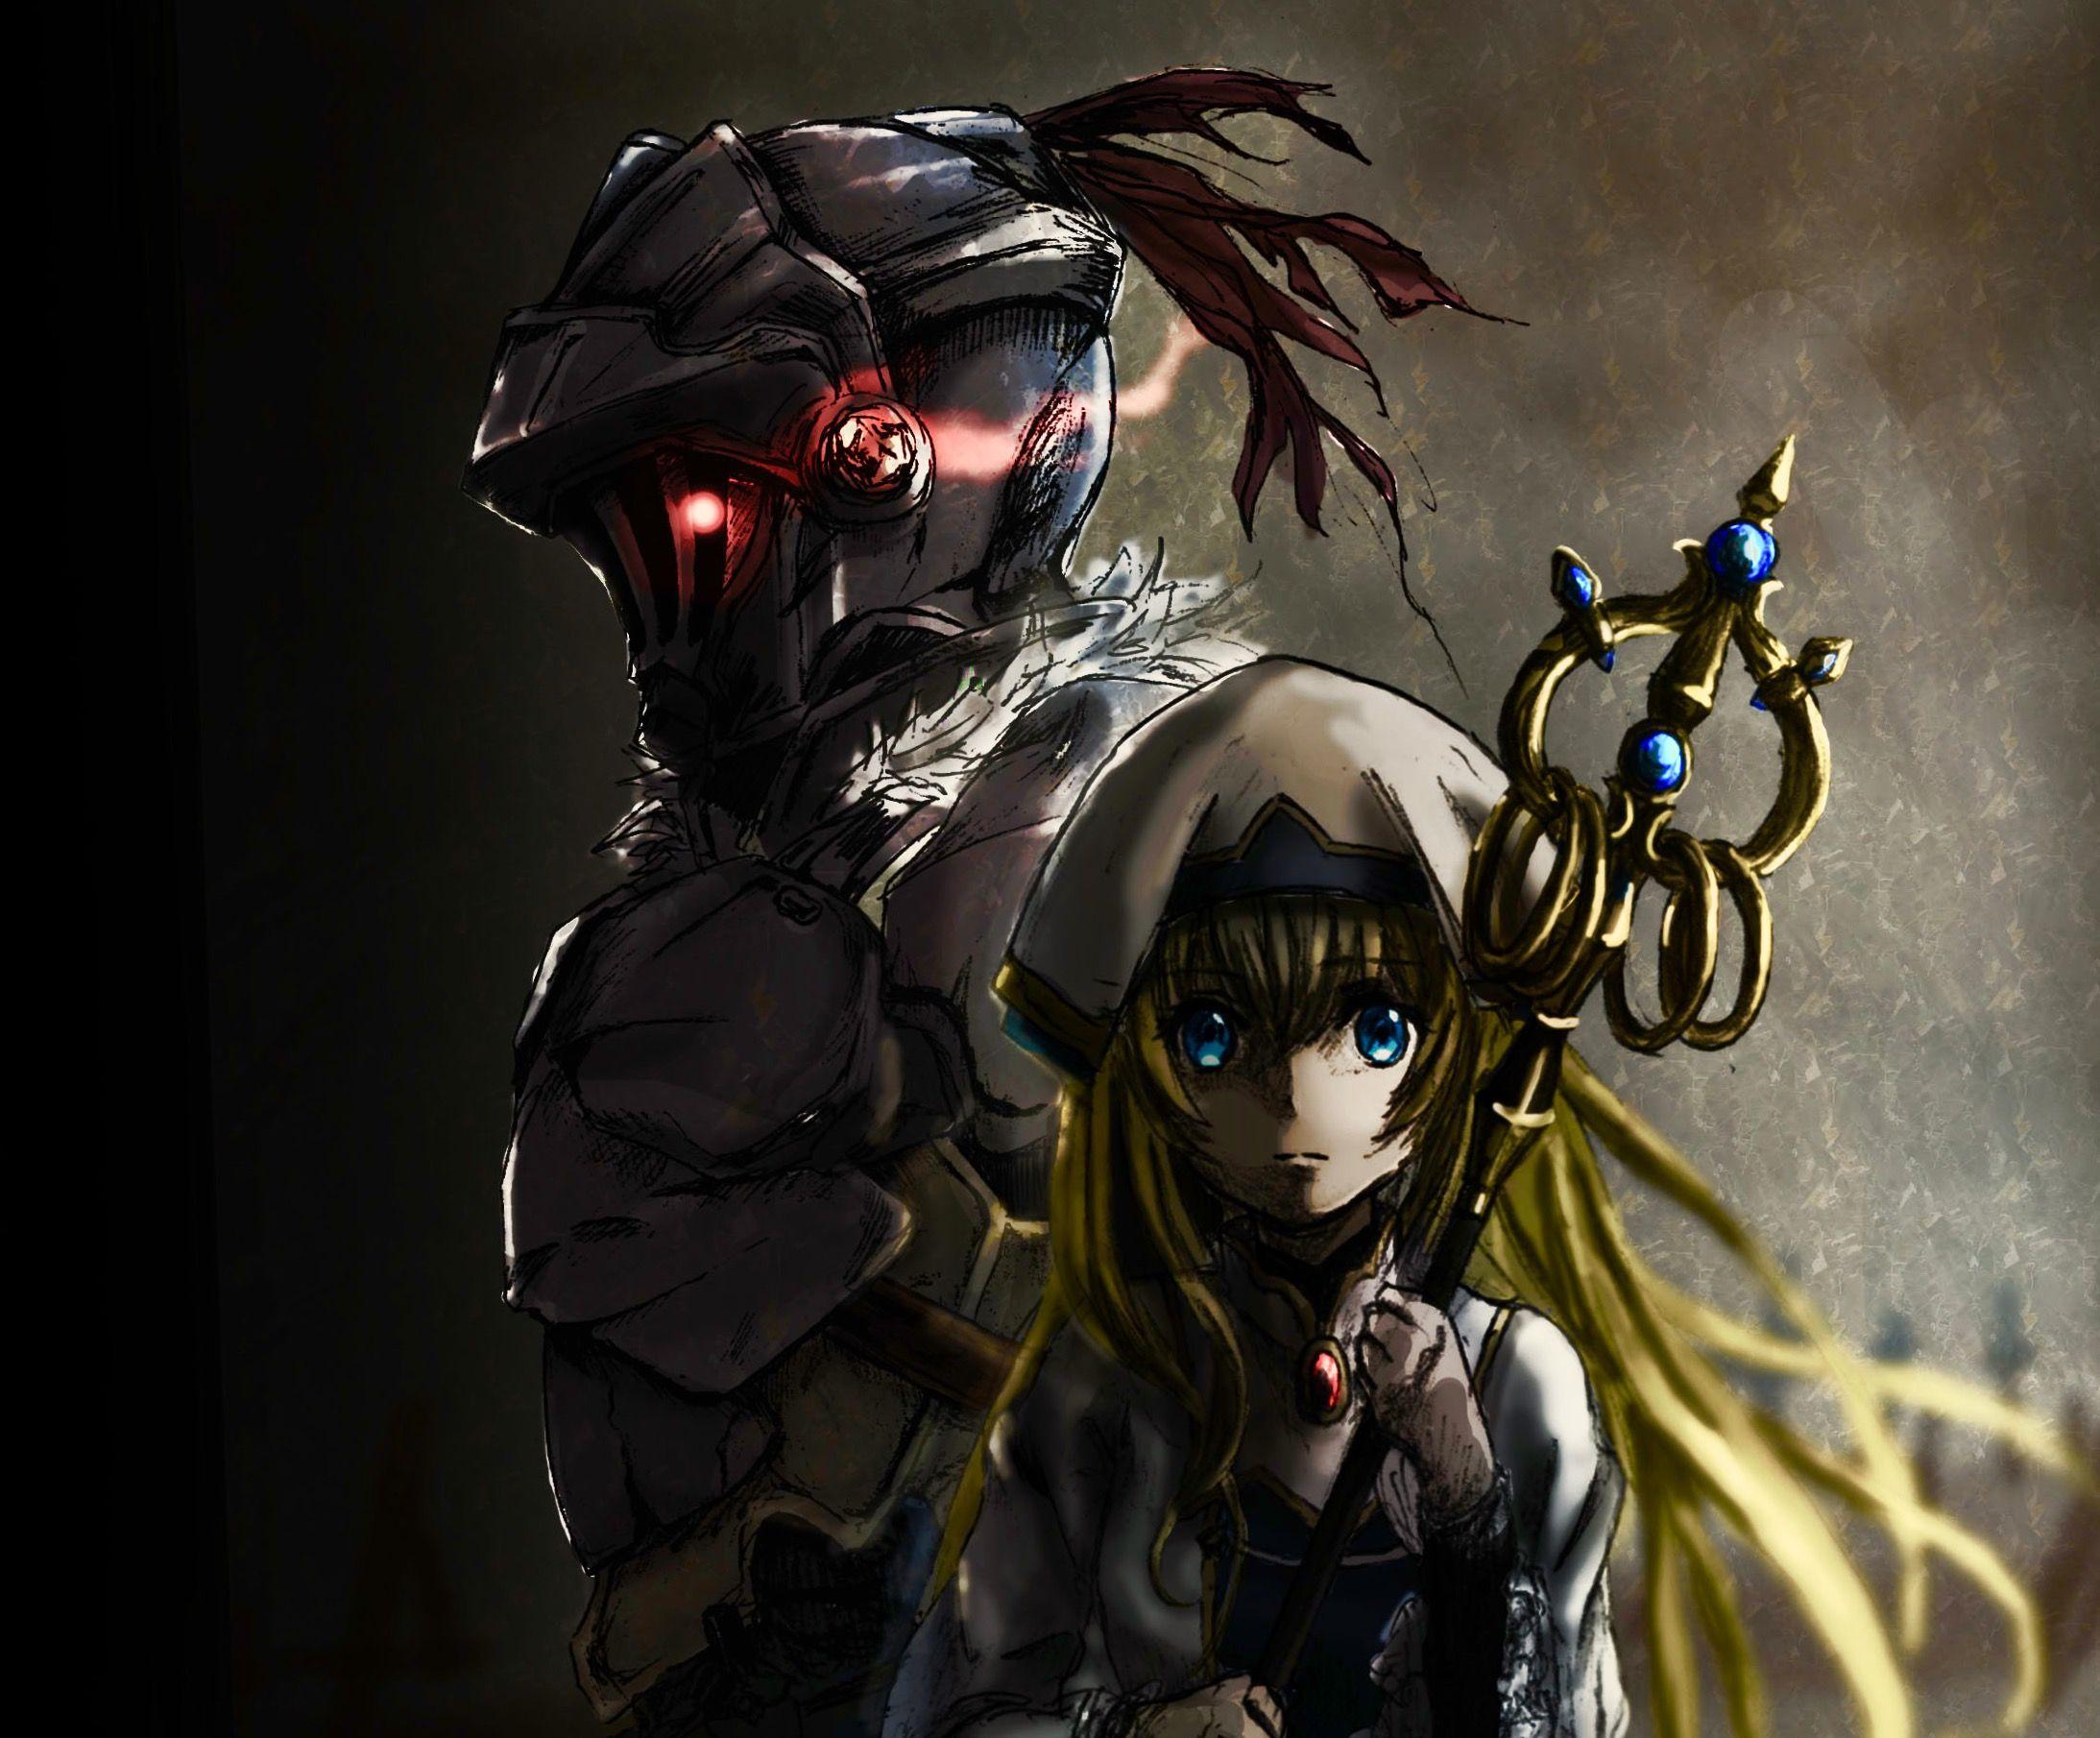 Goblin Slayer Y La Sacerdotisa Goblin Personajes De Anime Arte